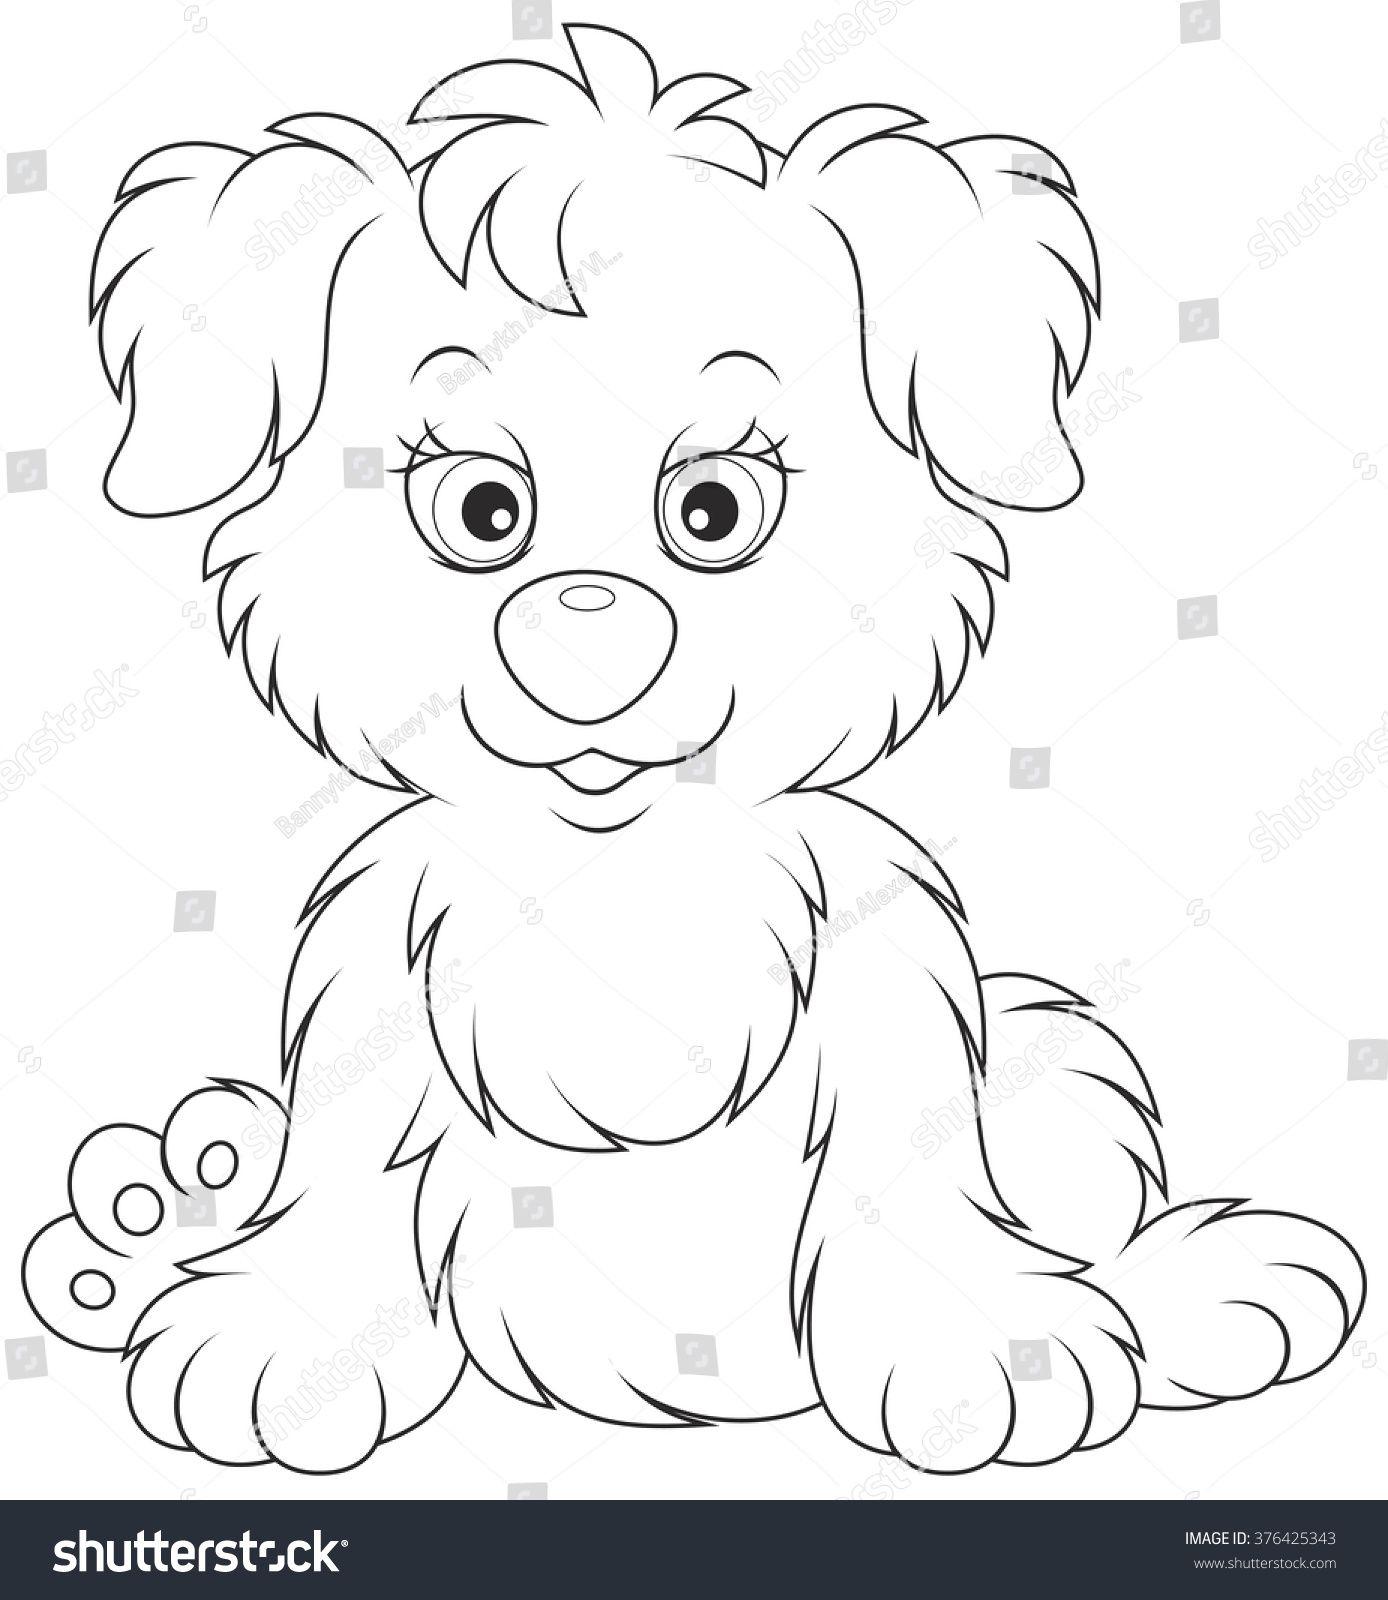 Puppy Wektorowa Ilustracja Stockowa Bez Tantiem 376425343 In 2020 Cartoon Clip Art Cute Drawings Art Drawings Simple